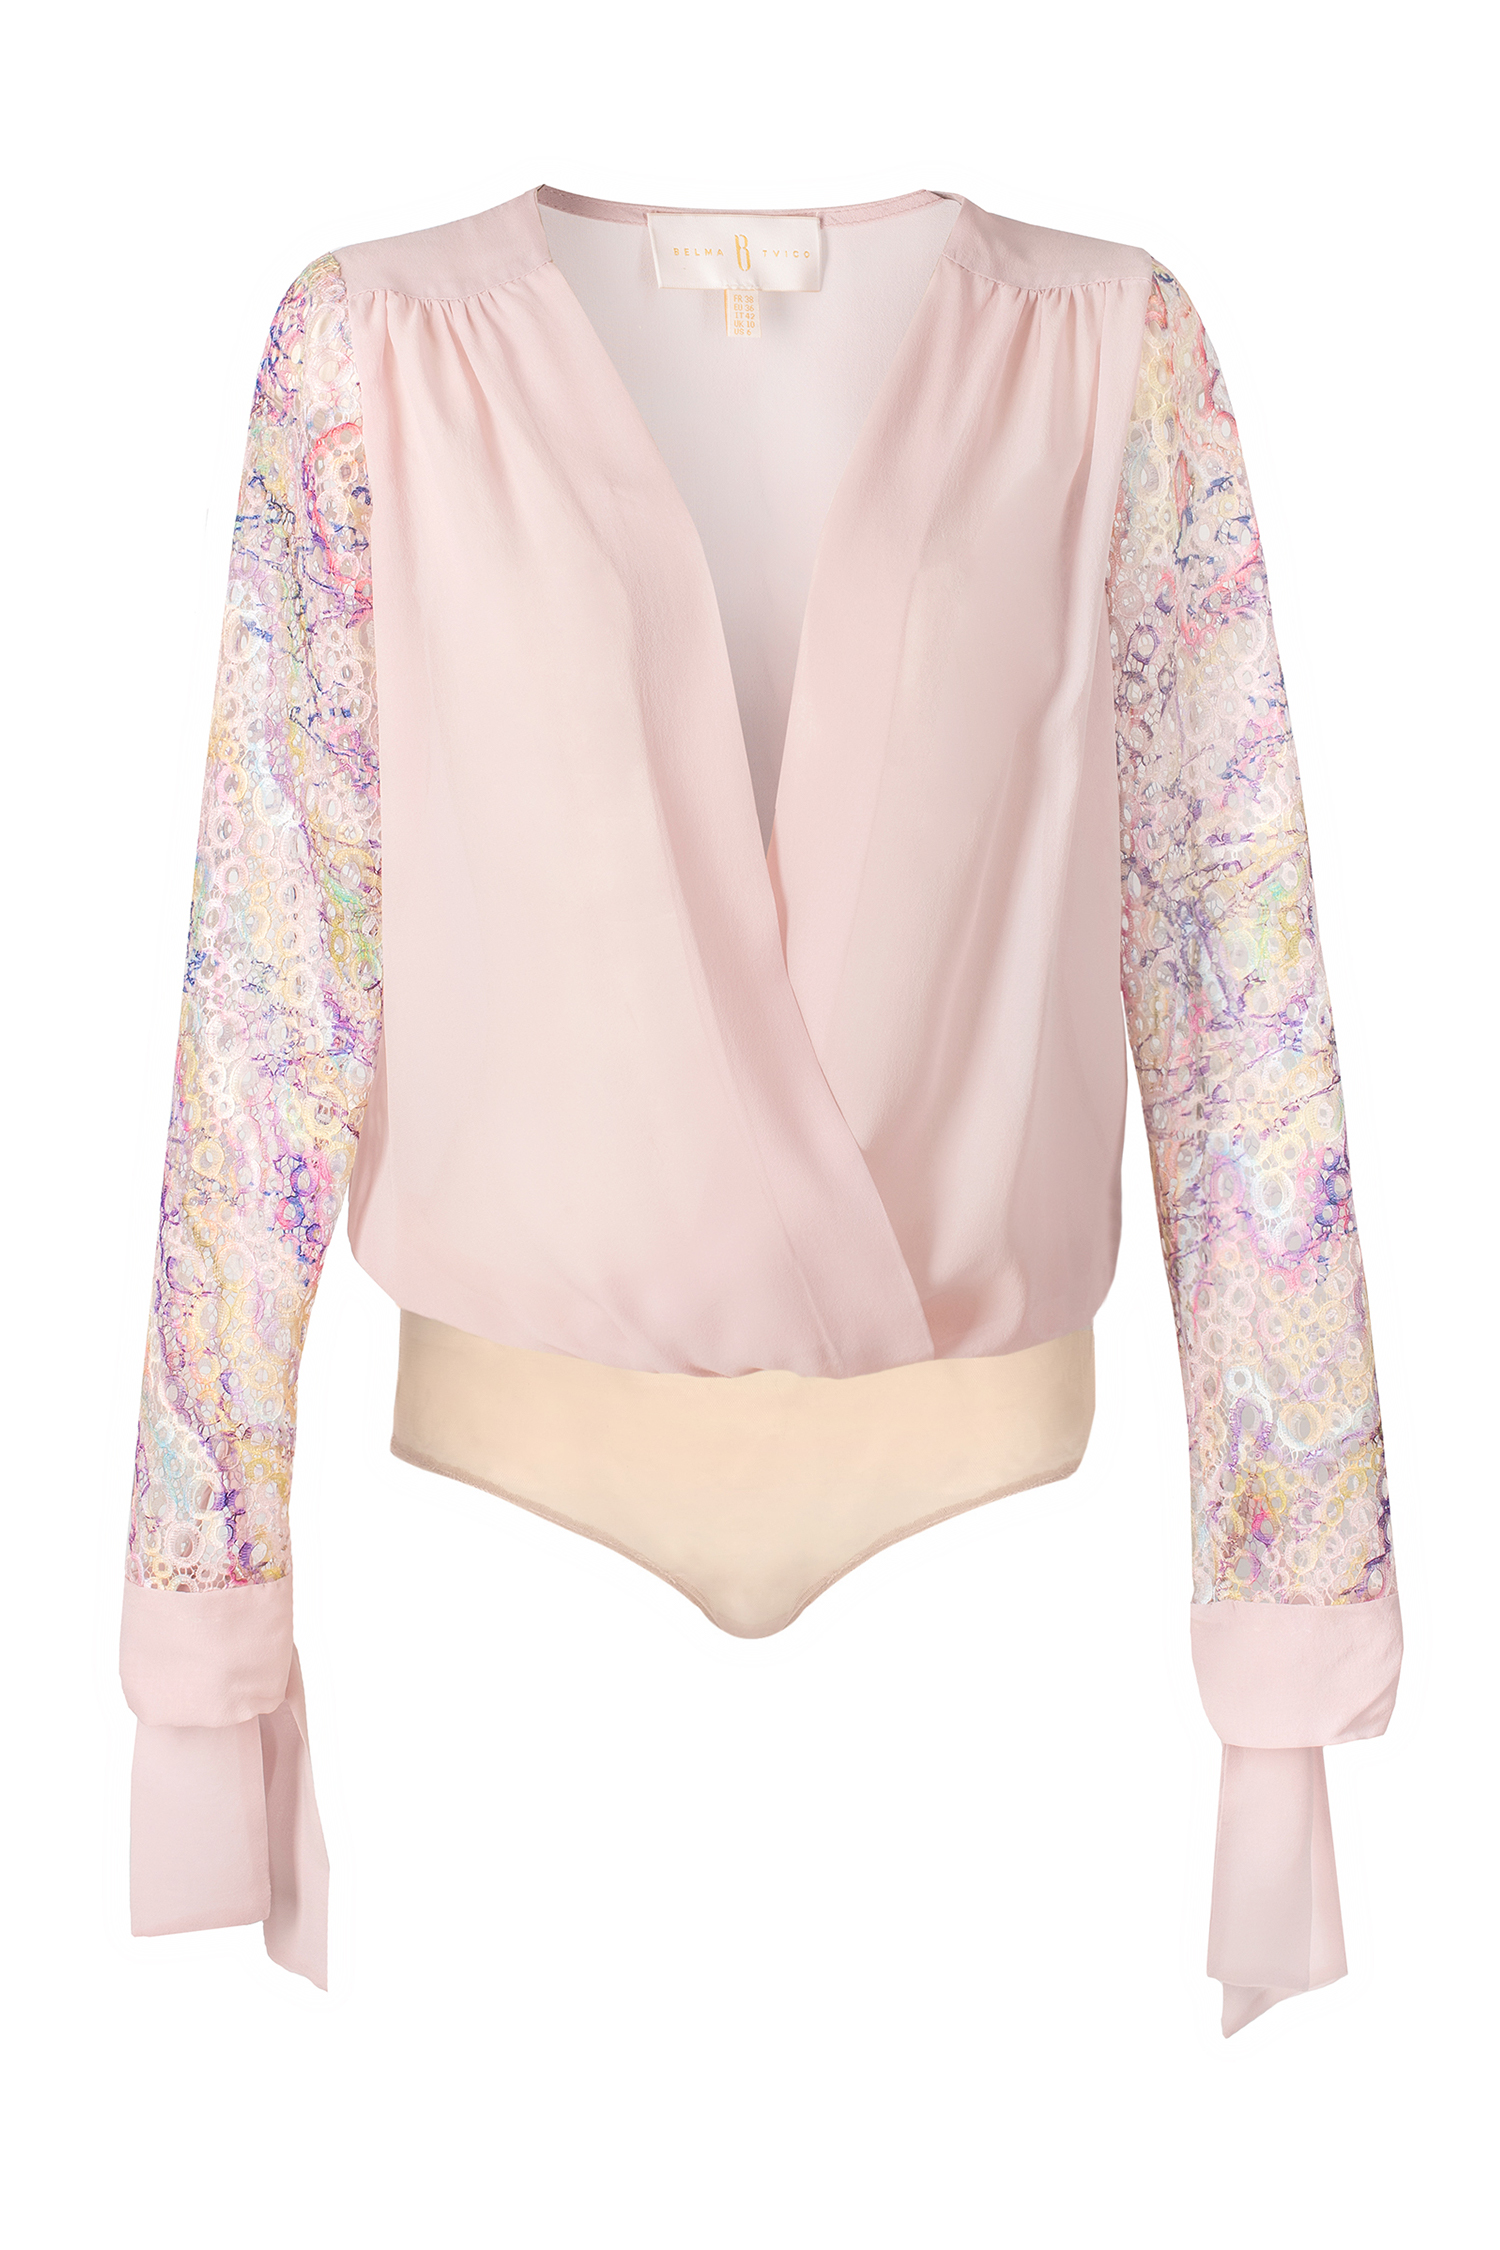 bodysuit,lace, blouse, ss21, print